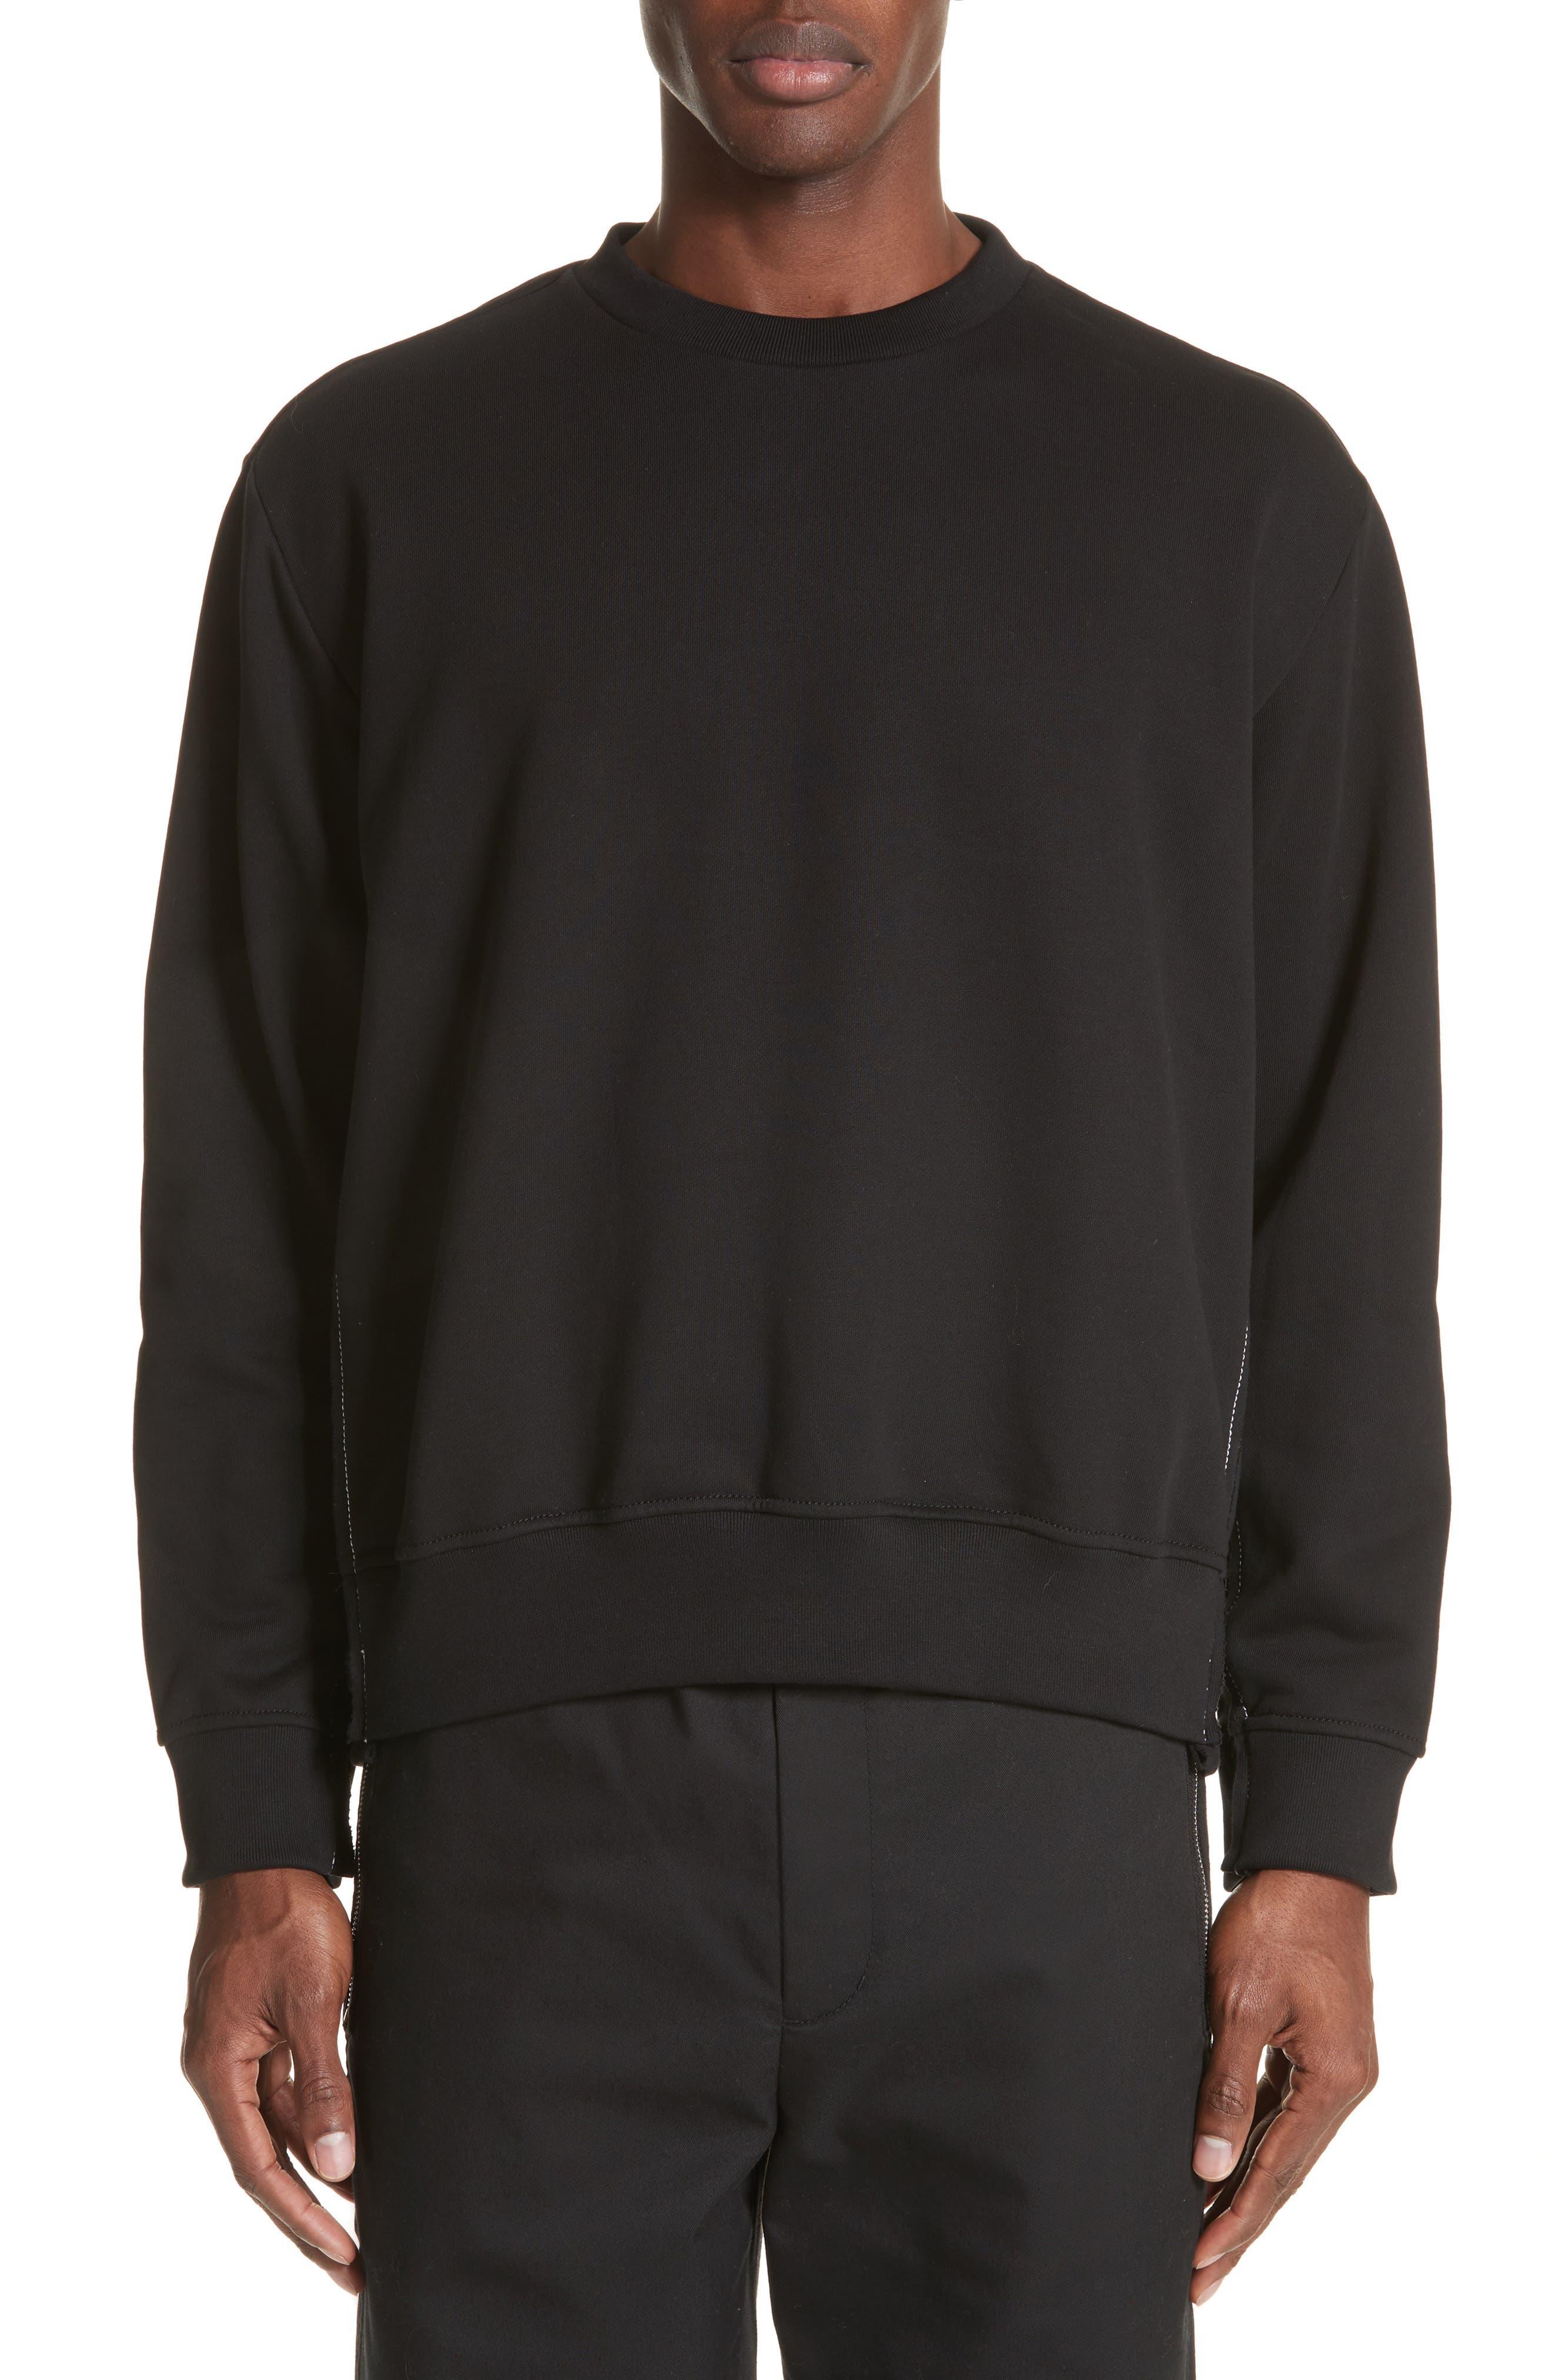 Reconstructed Crewneck Sweatshirt,                         Main,                         color, Black